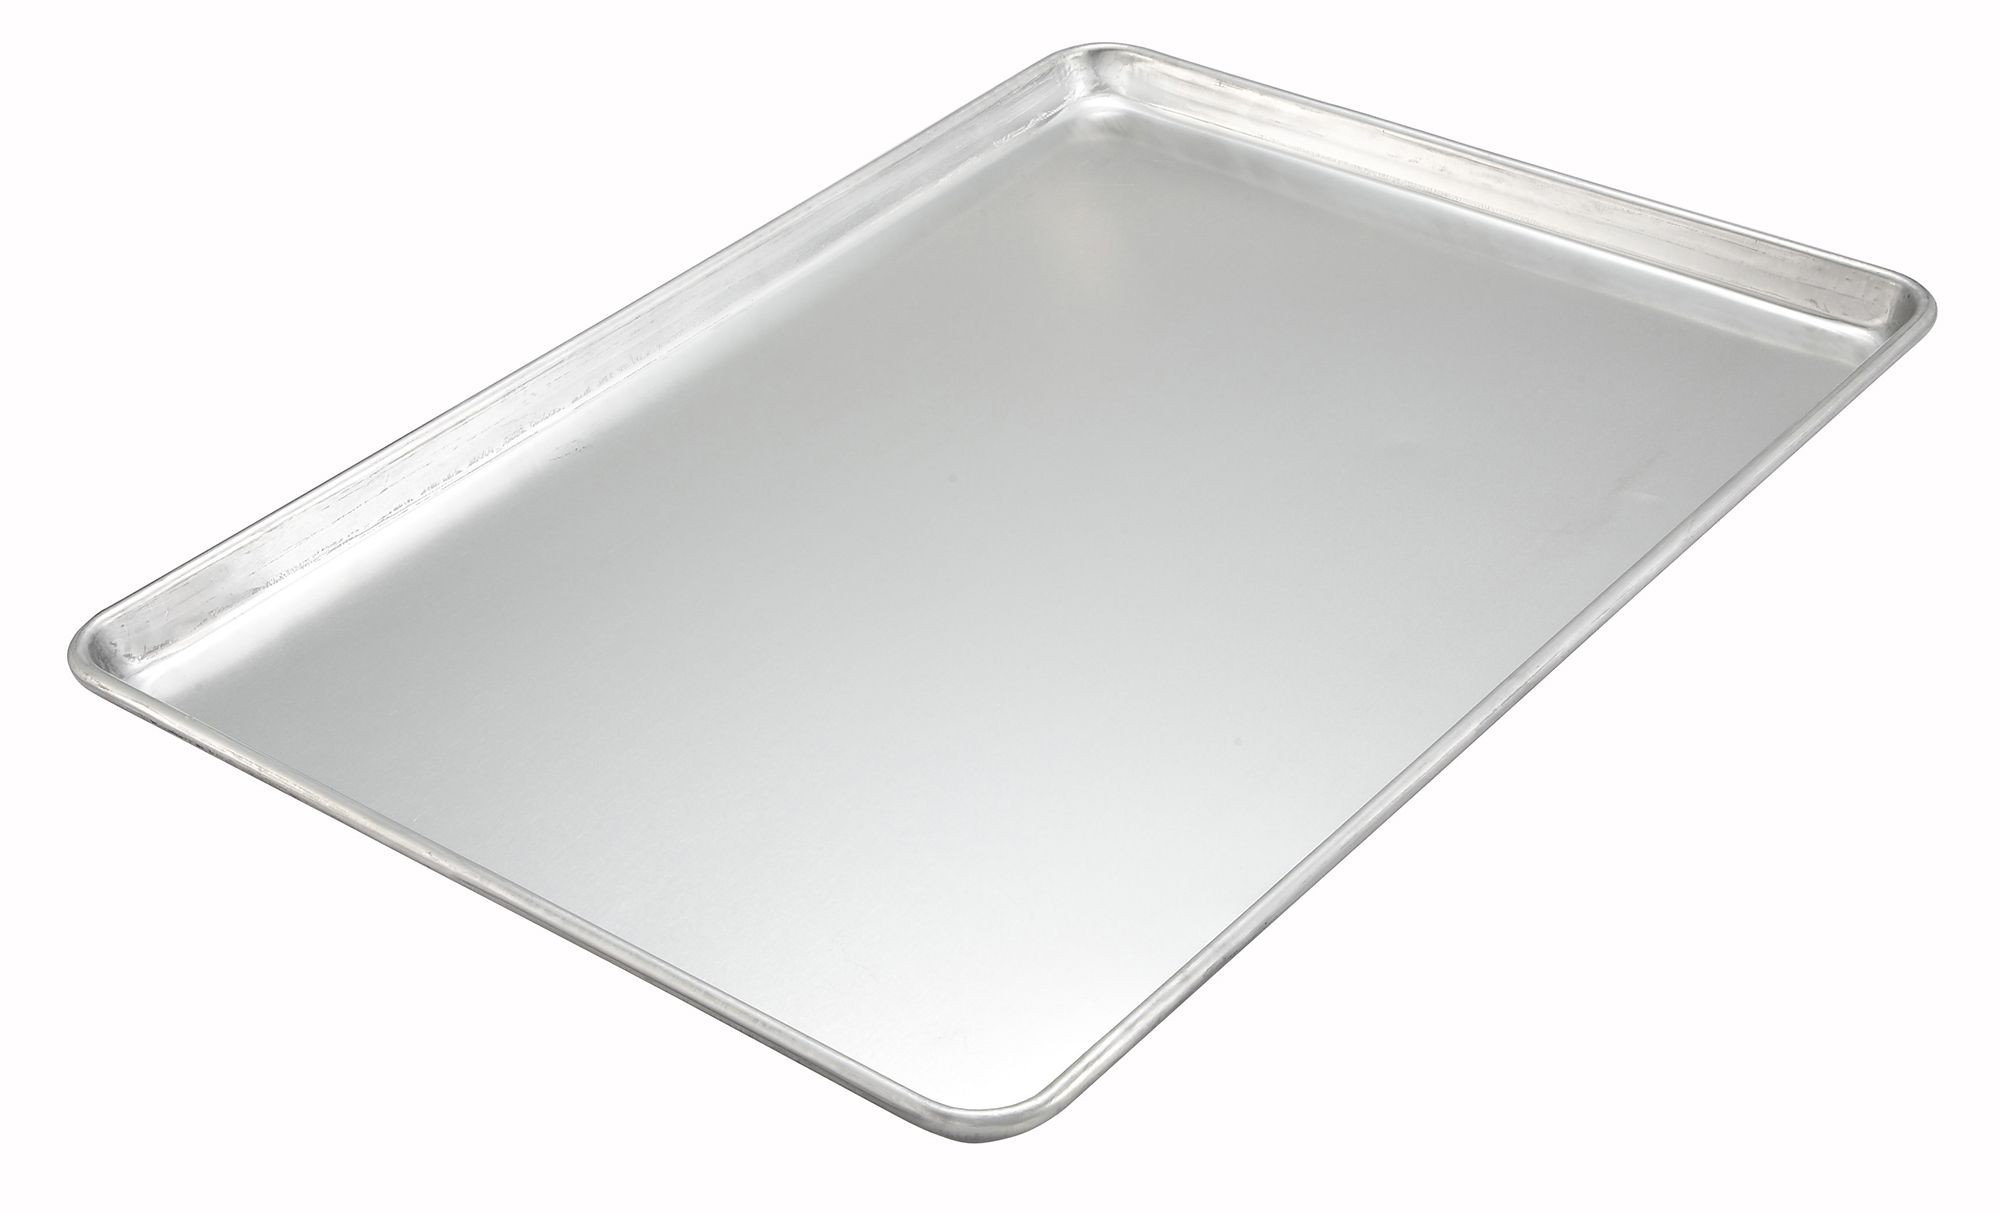 "Winco ALXP-1813H 13"" x 18"" Aluminum 18 Gauge Sheet Pan"